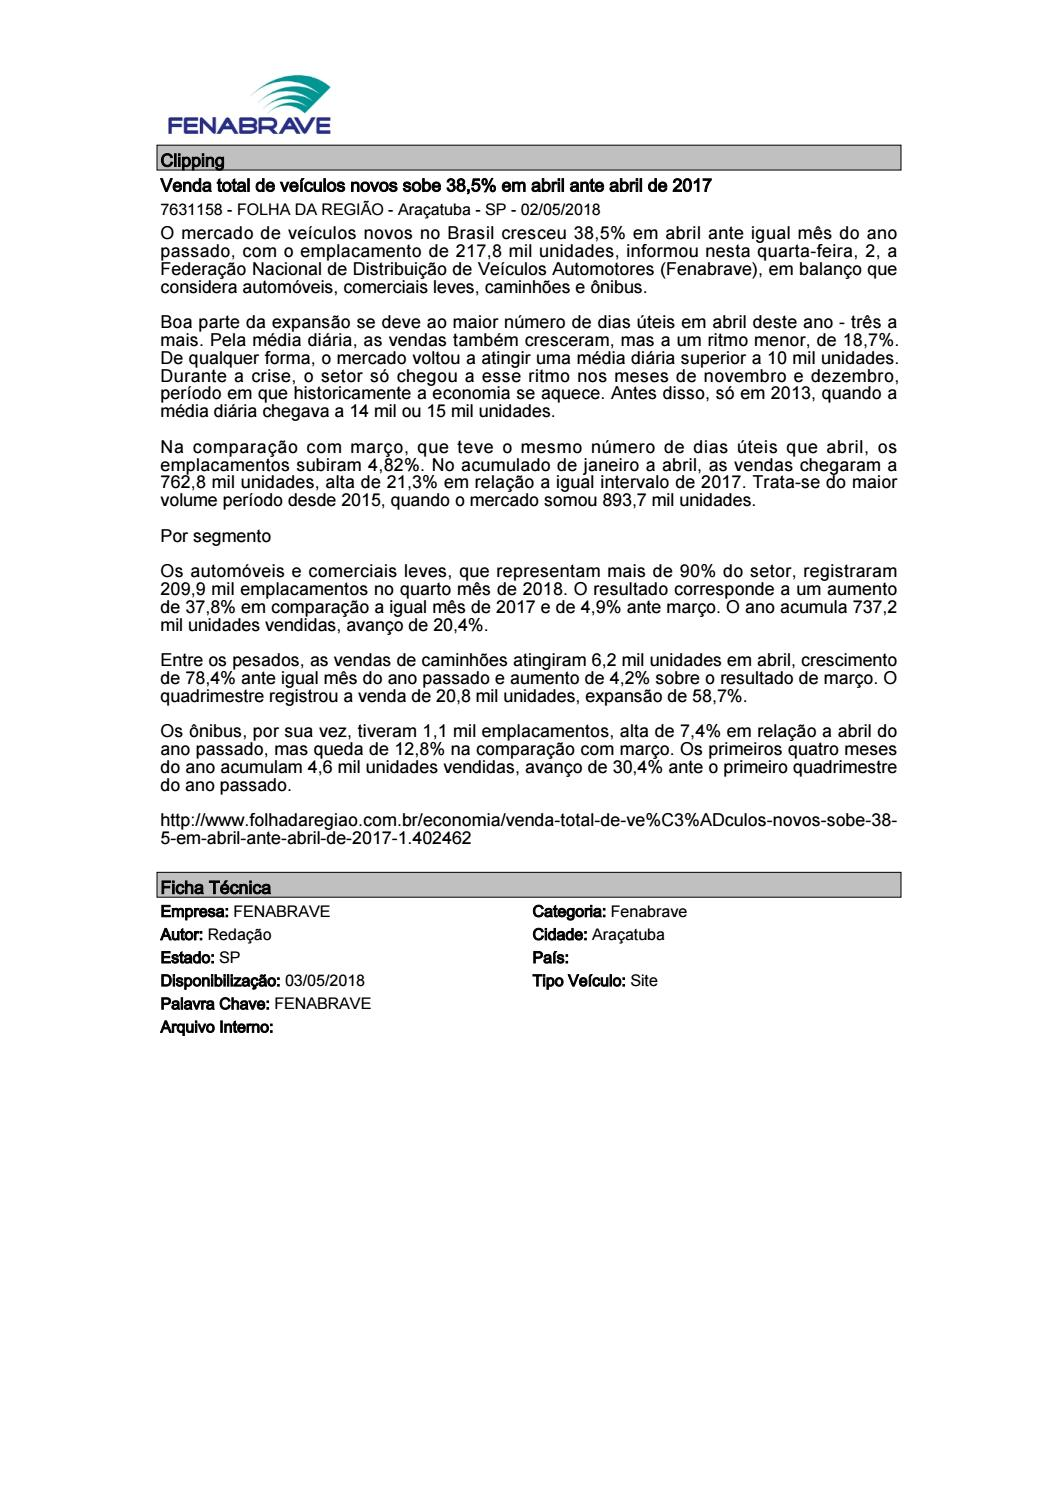 09c715b835f12 Clipping Fenabrave 03.05.2018 by MCE Comunicação - issuu